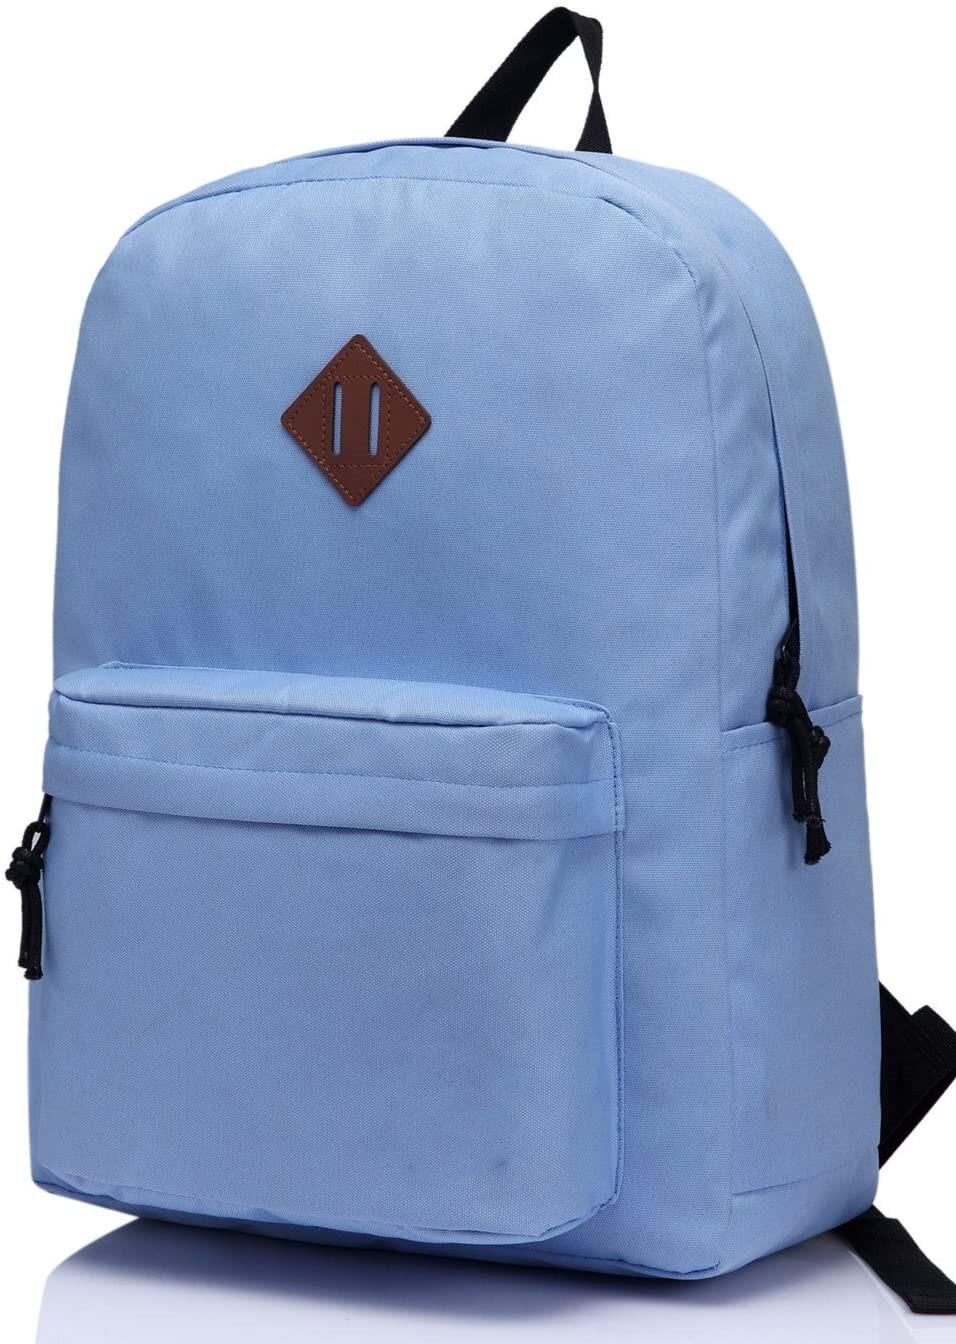 fashion waterproof school backpacks for teenagers